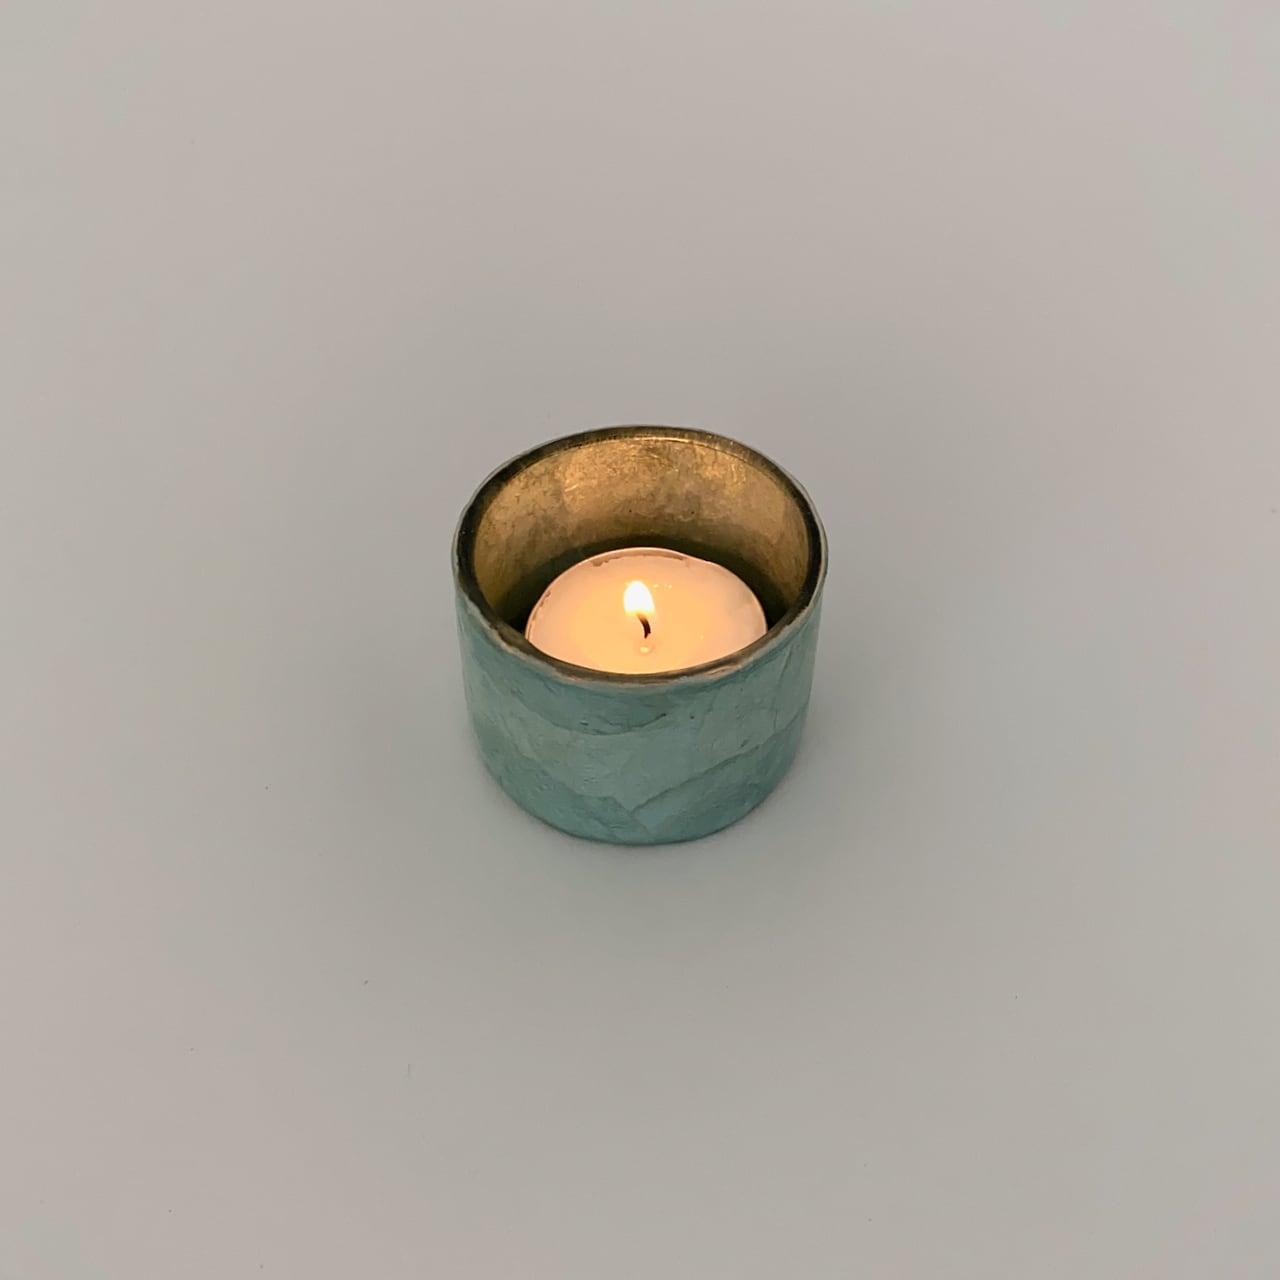 Votive Candleholder Turquoise Greyed Mint|ボーティブ キャンドルホルダー ターコイズ グレイドミント